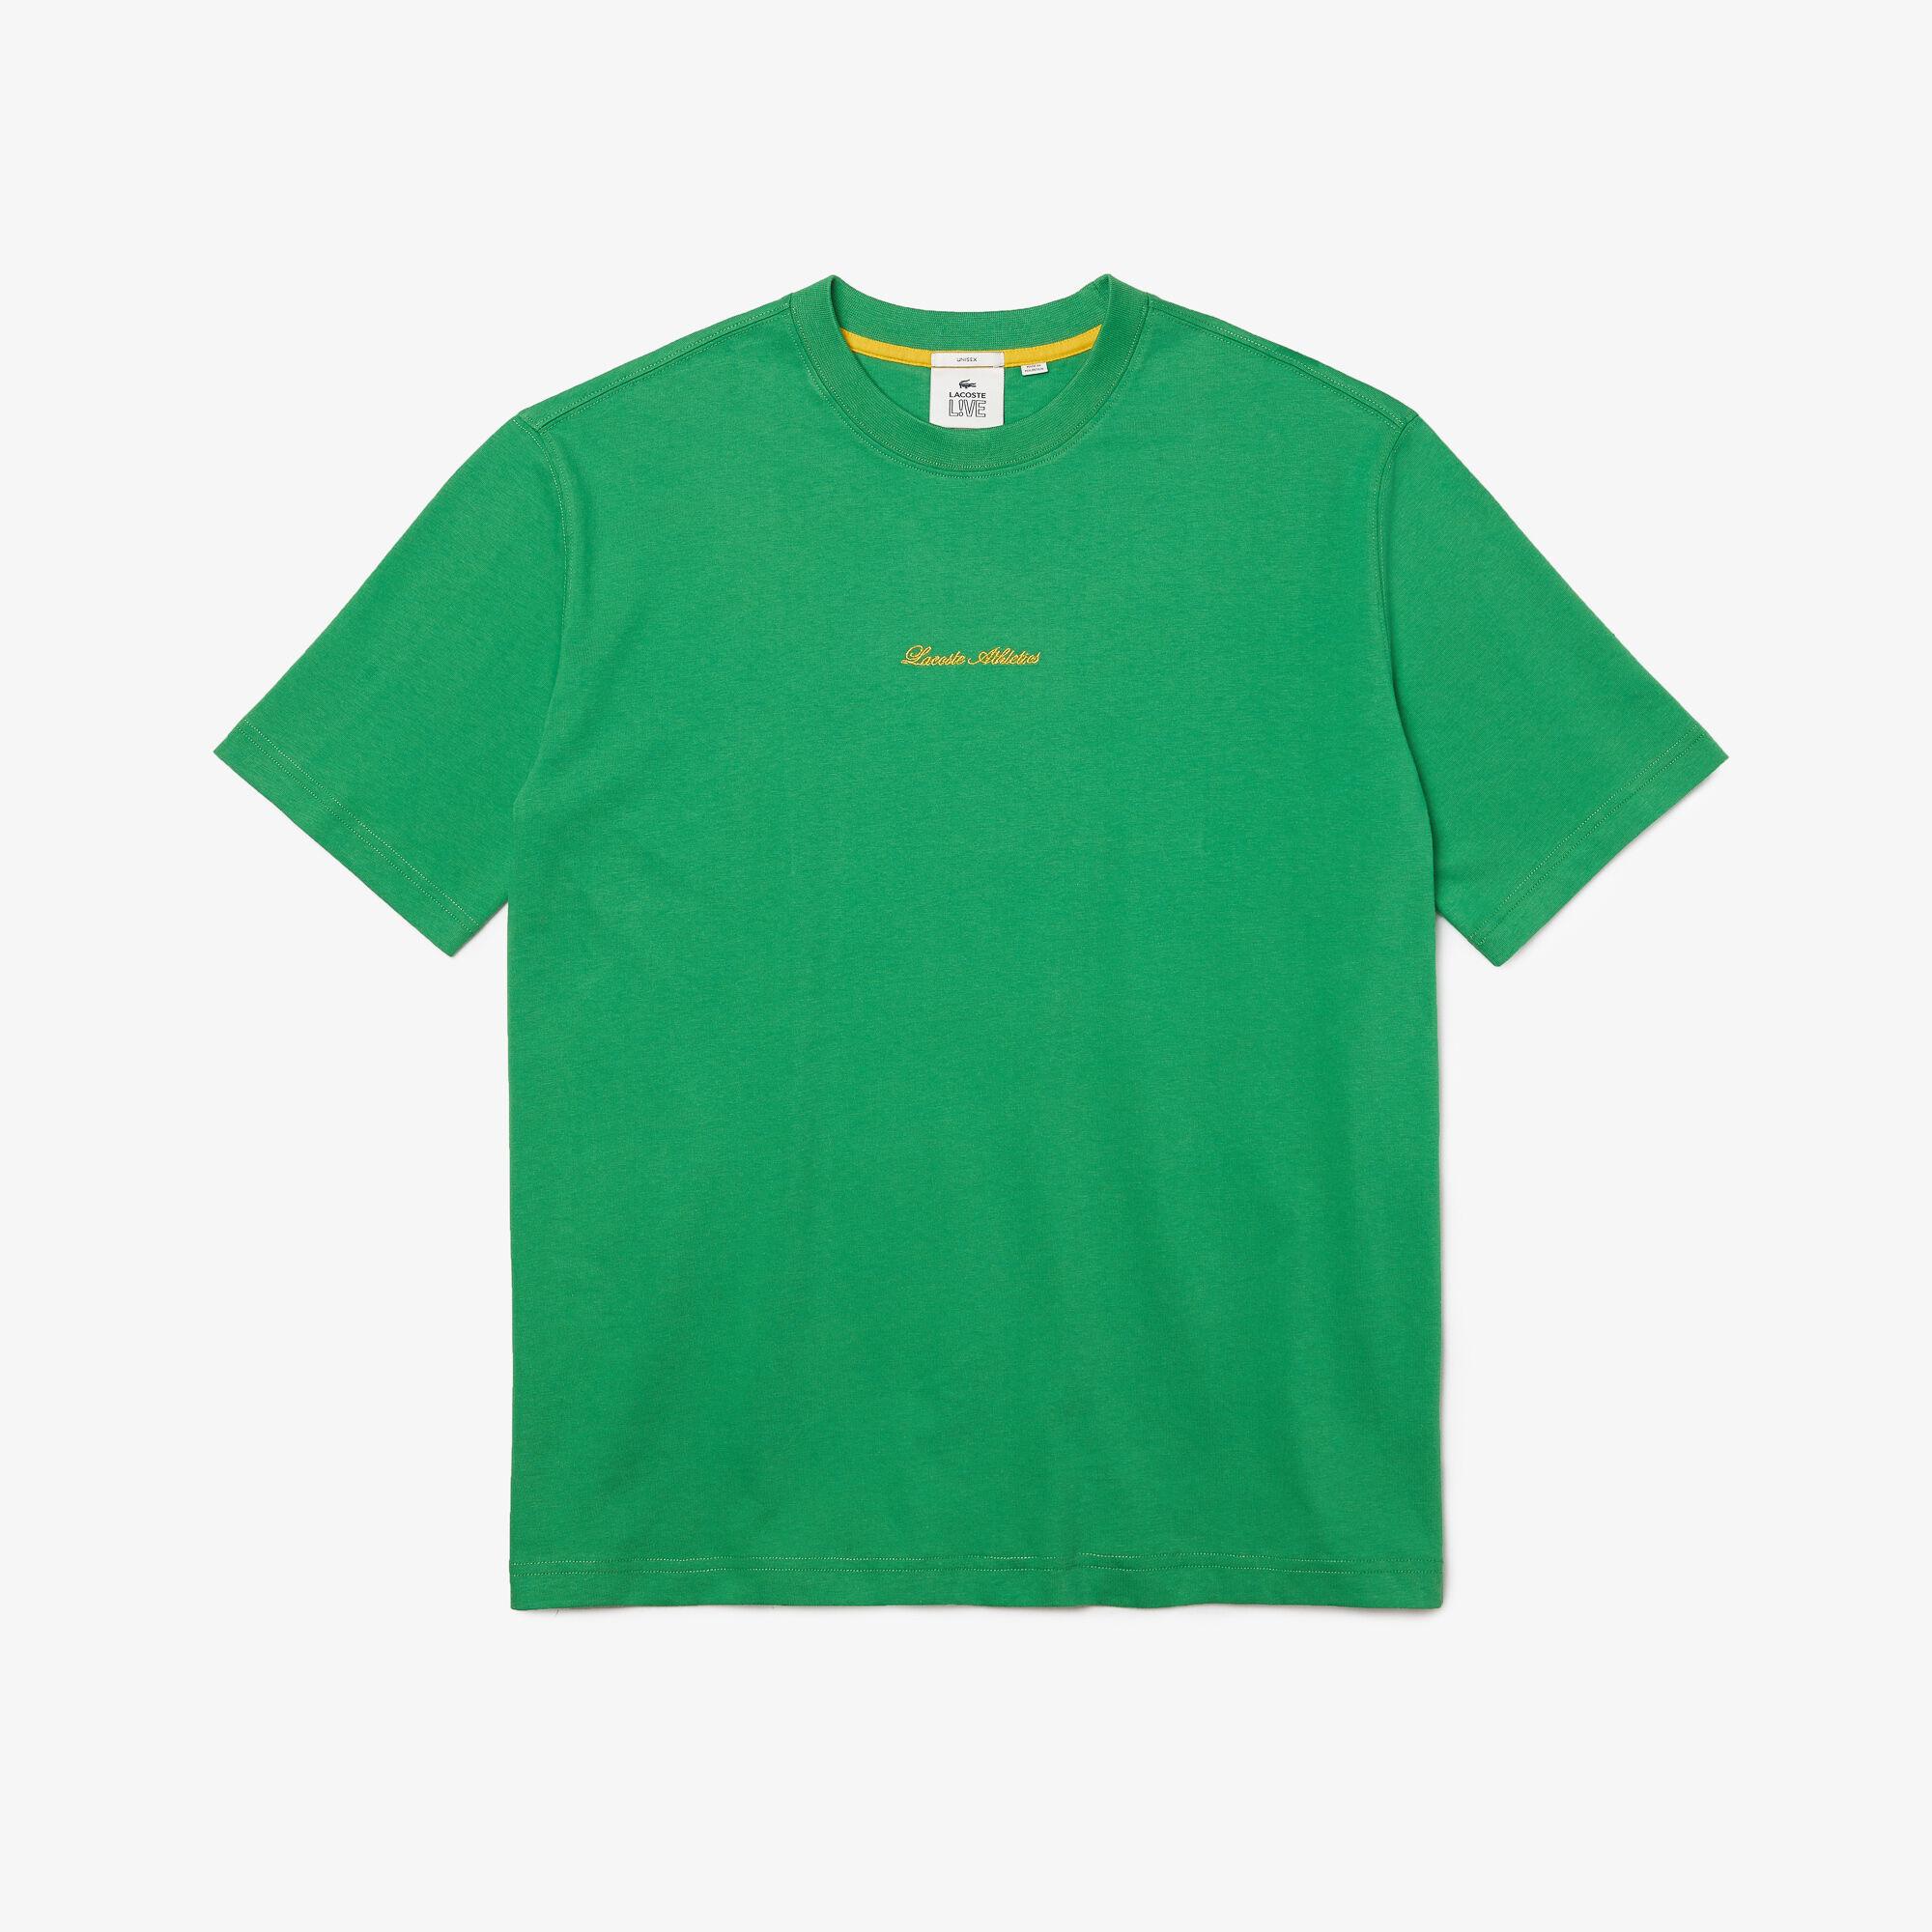 Unisex Lacoste LIVE Loose Fit Golden Embroidery Cotton T-shirt